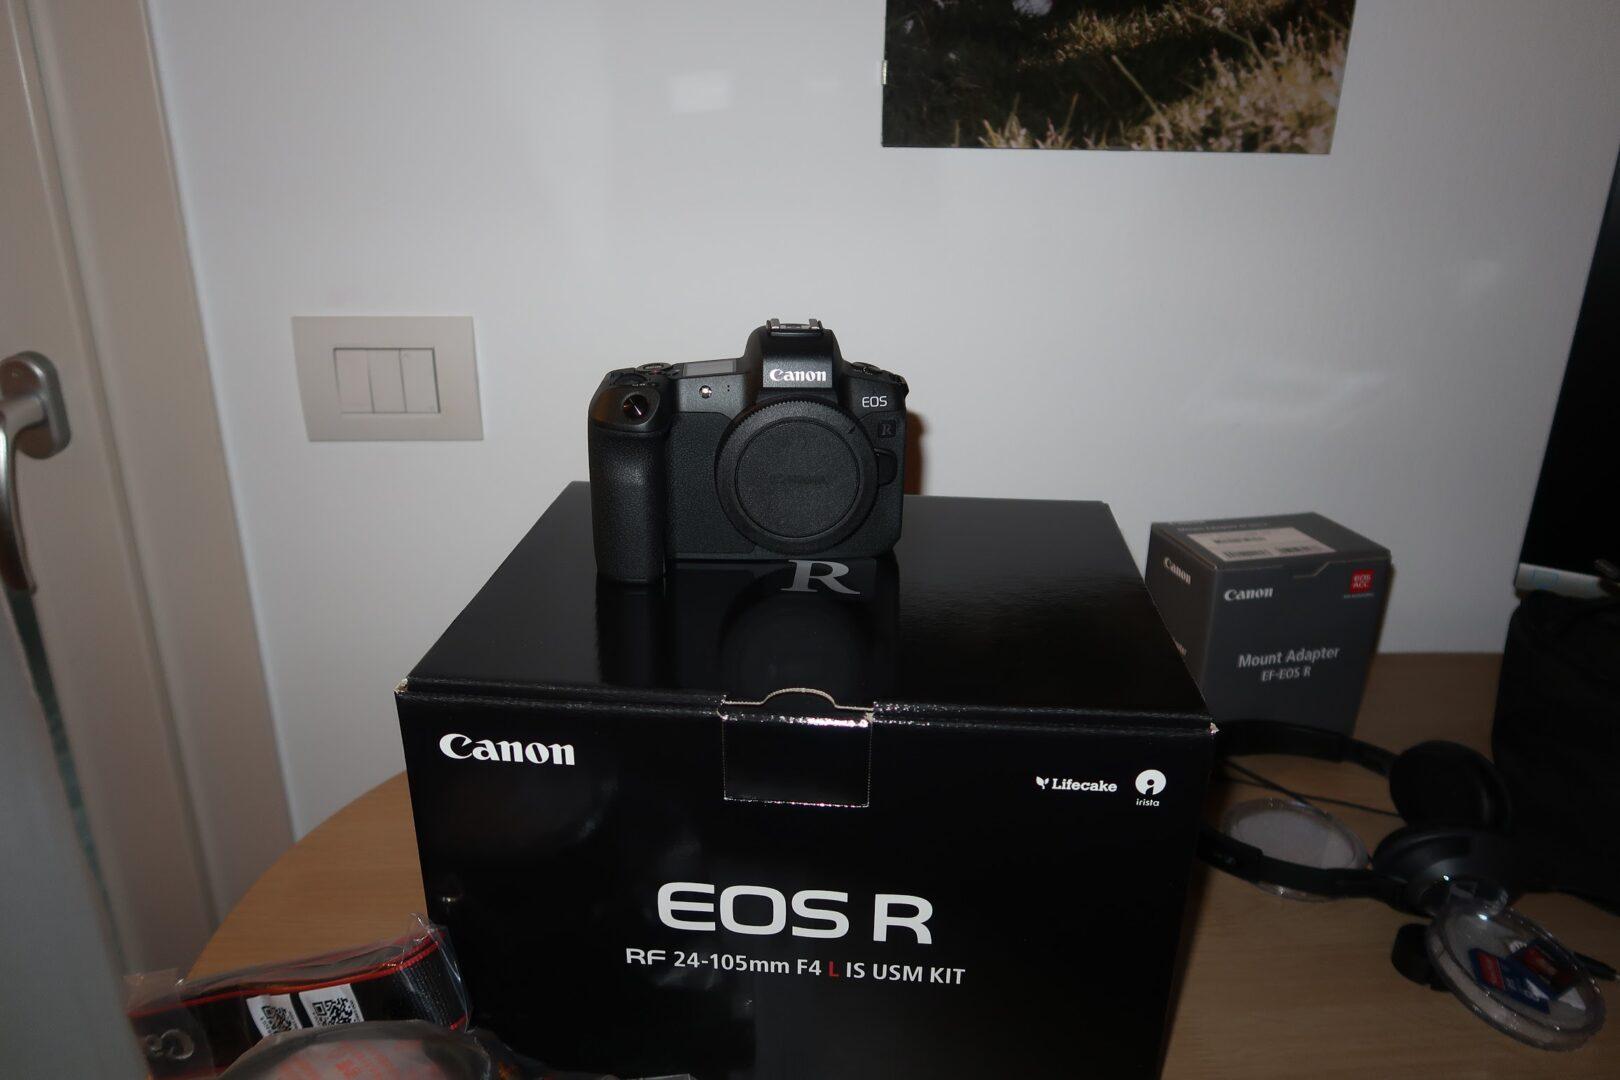 Canon EOS R: Mirrorless full-frame